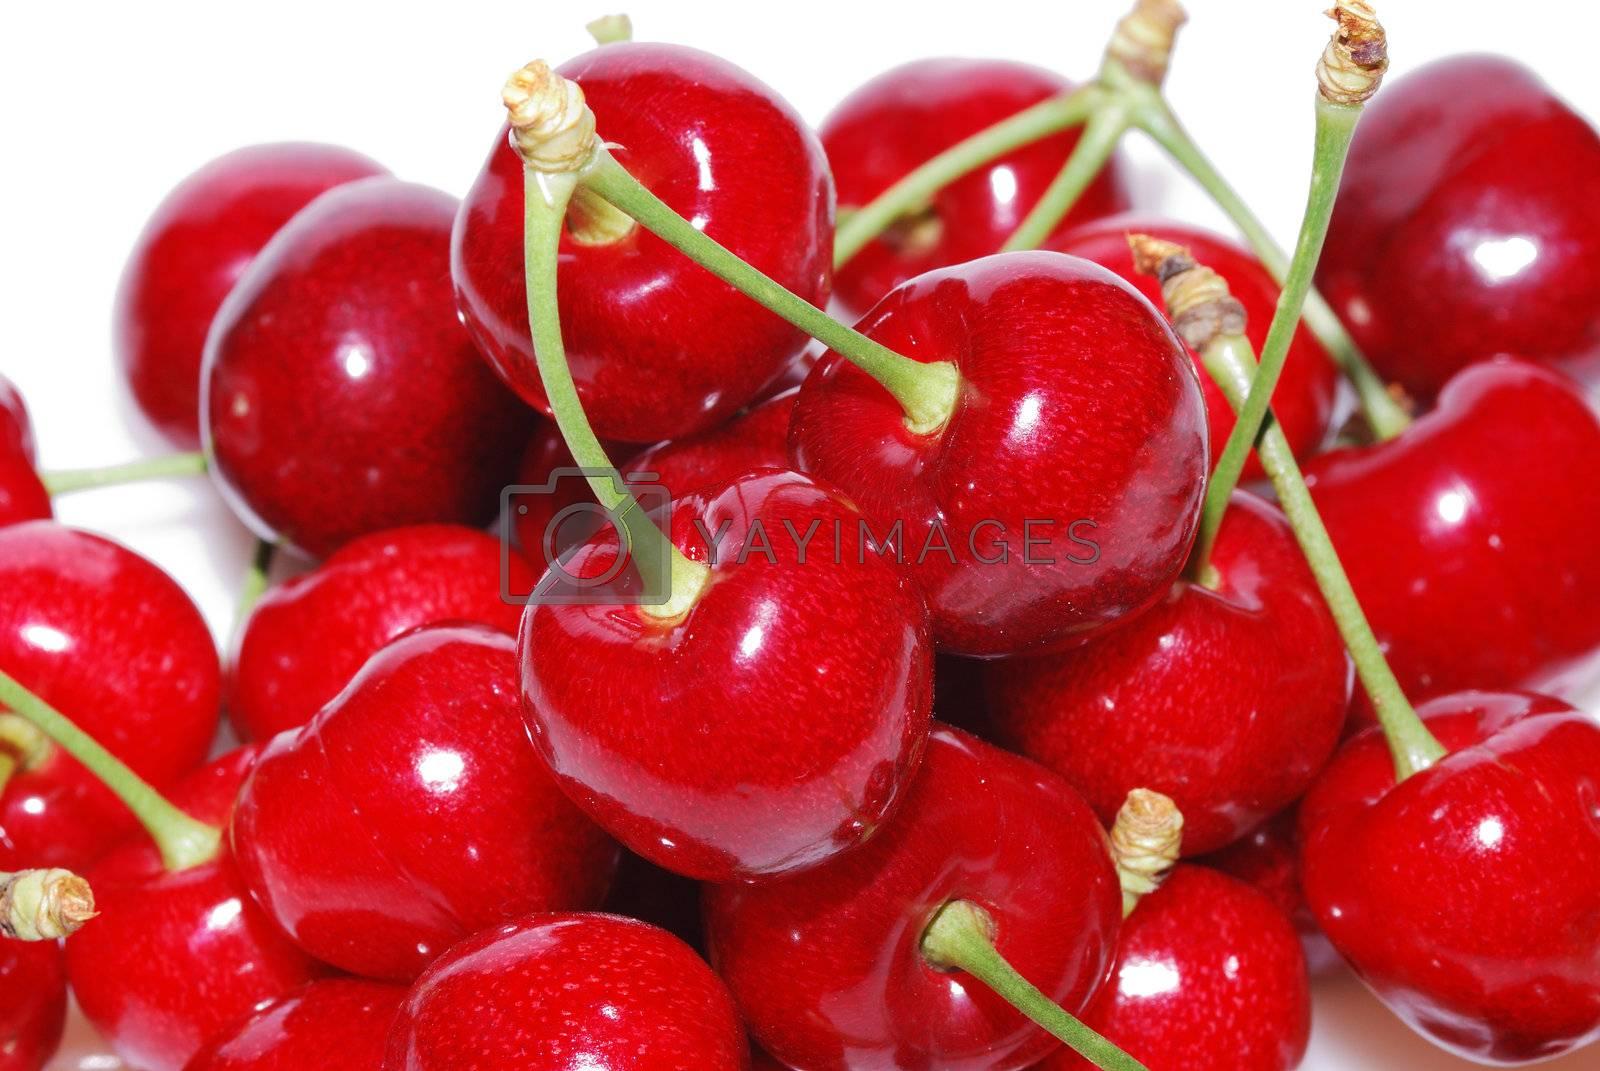 crispy sweet ripe red cherries many large view